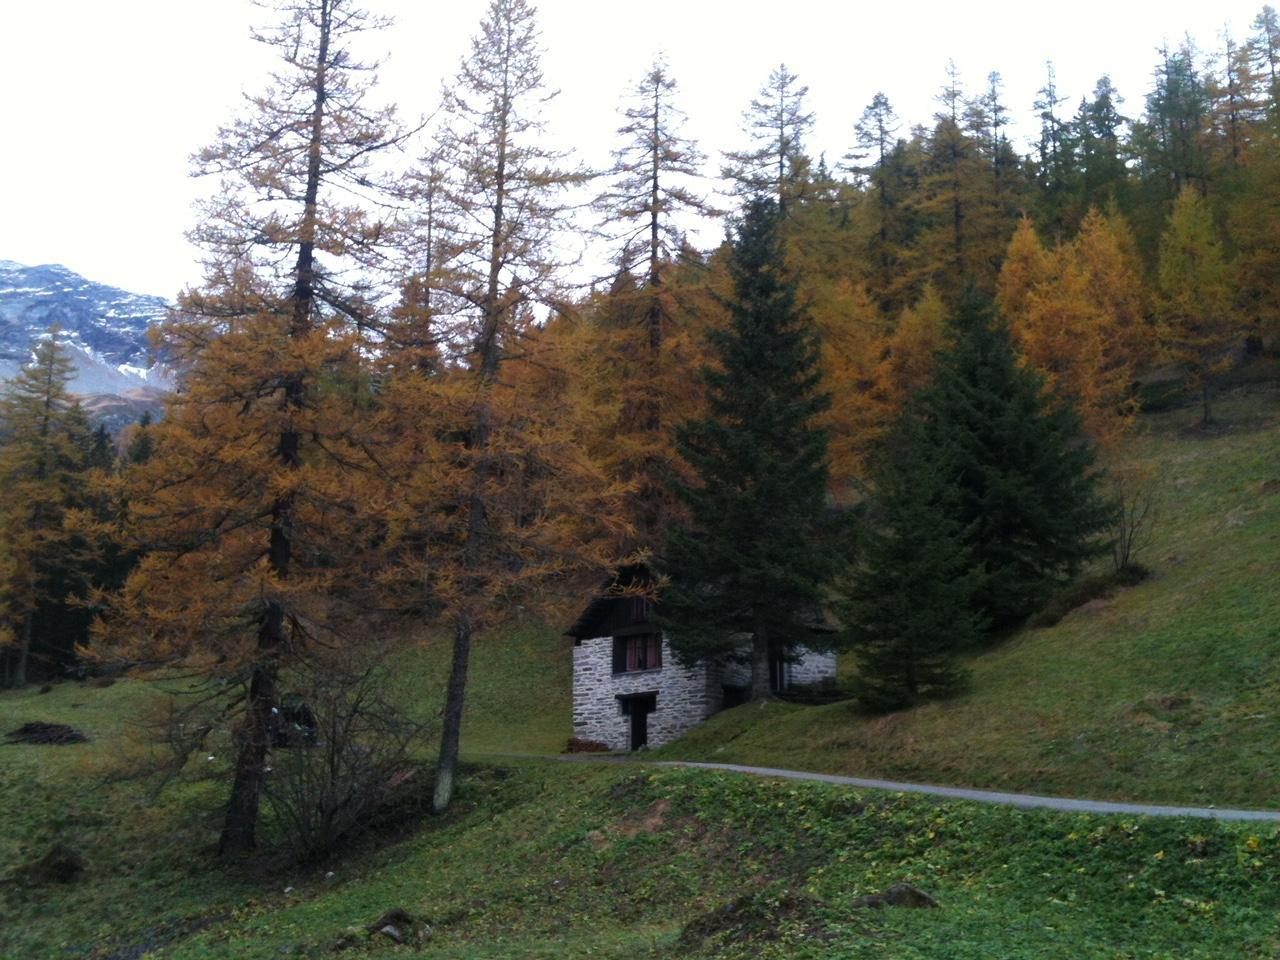 Ferienhaus Rustico Bersacola (2529672), Bosco Gurin, Maggiatal, Tessin, Schweiz, Bild 6